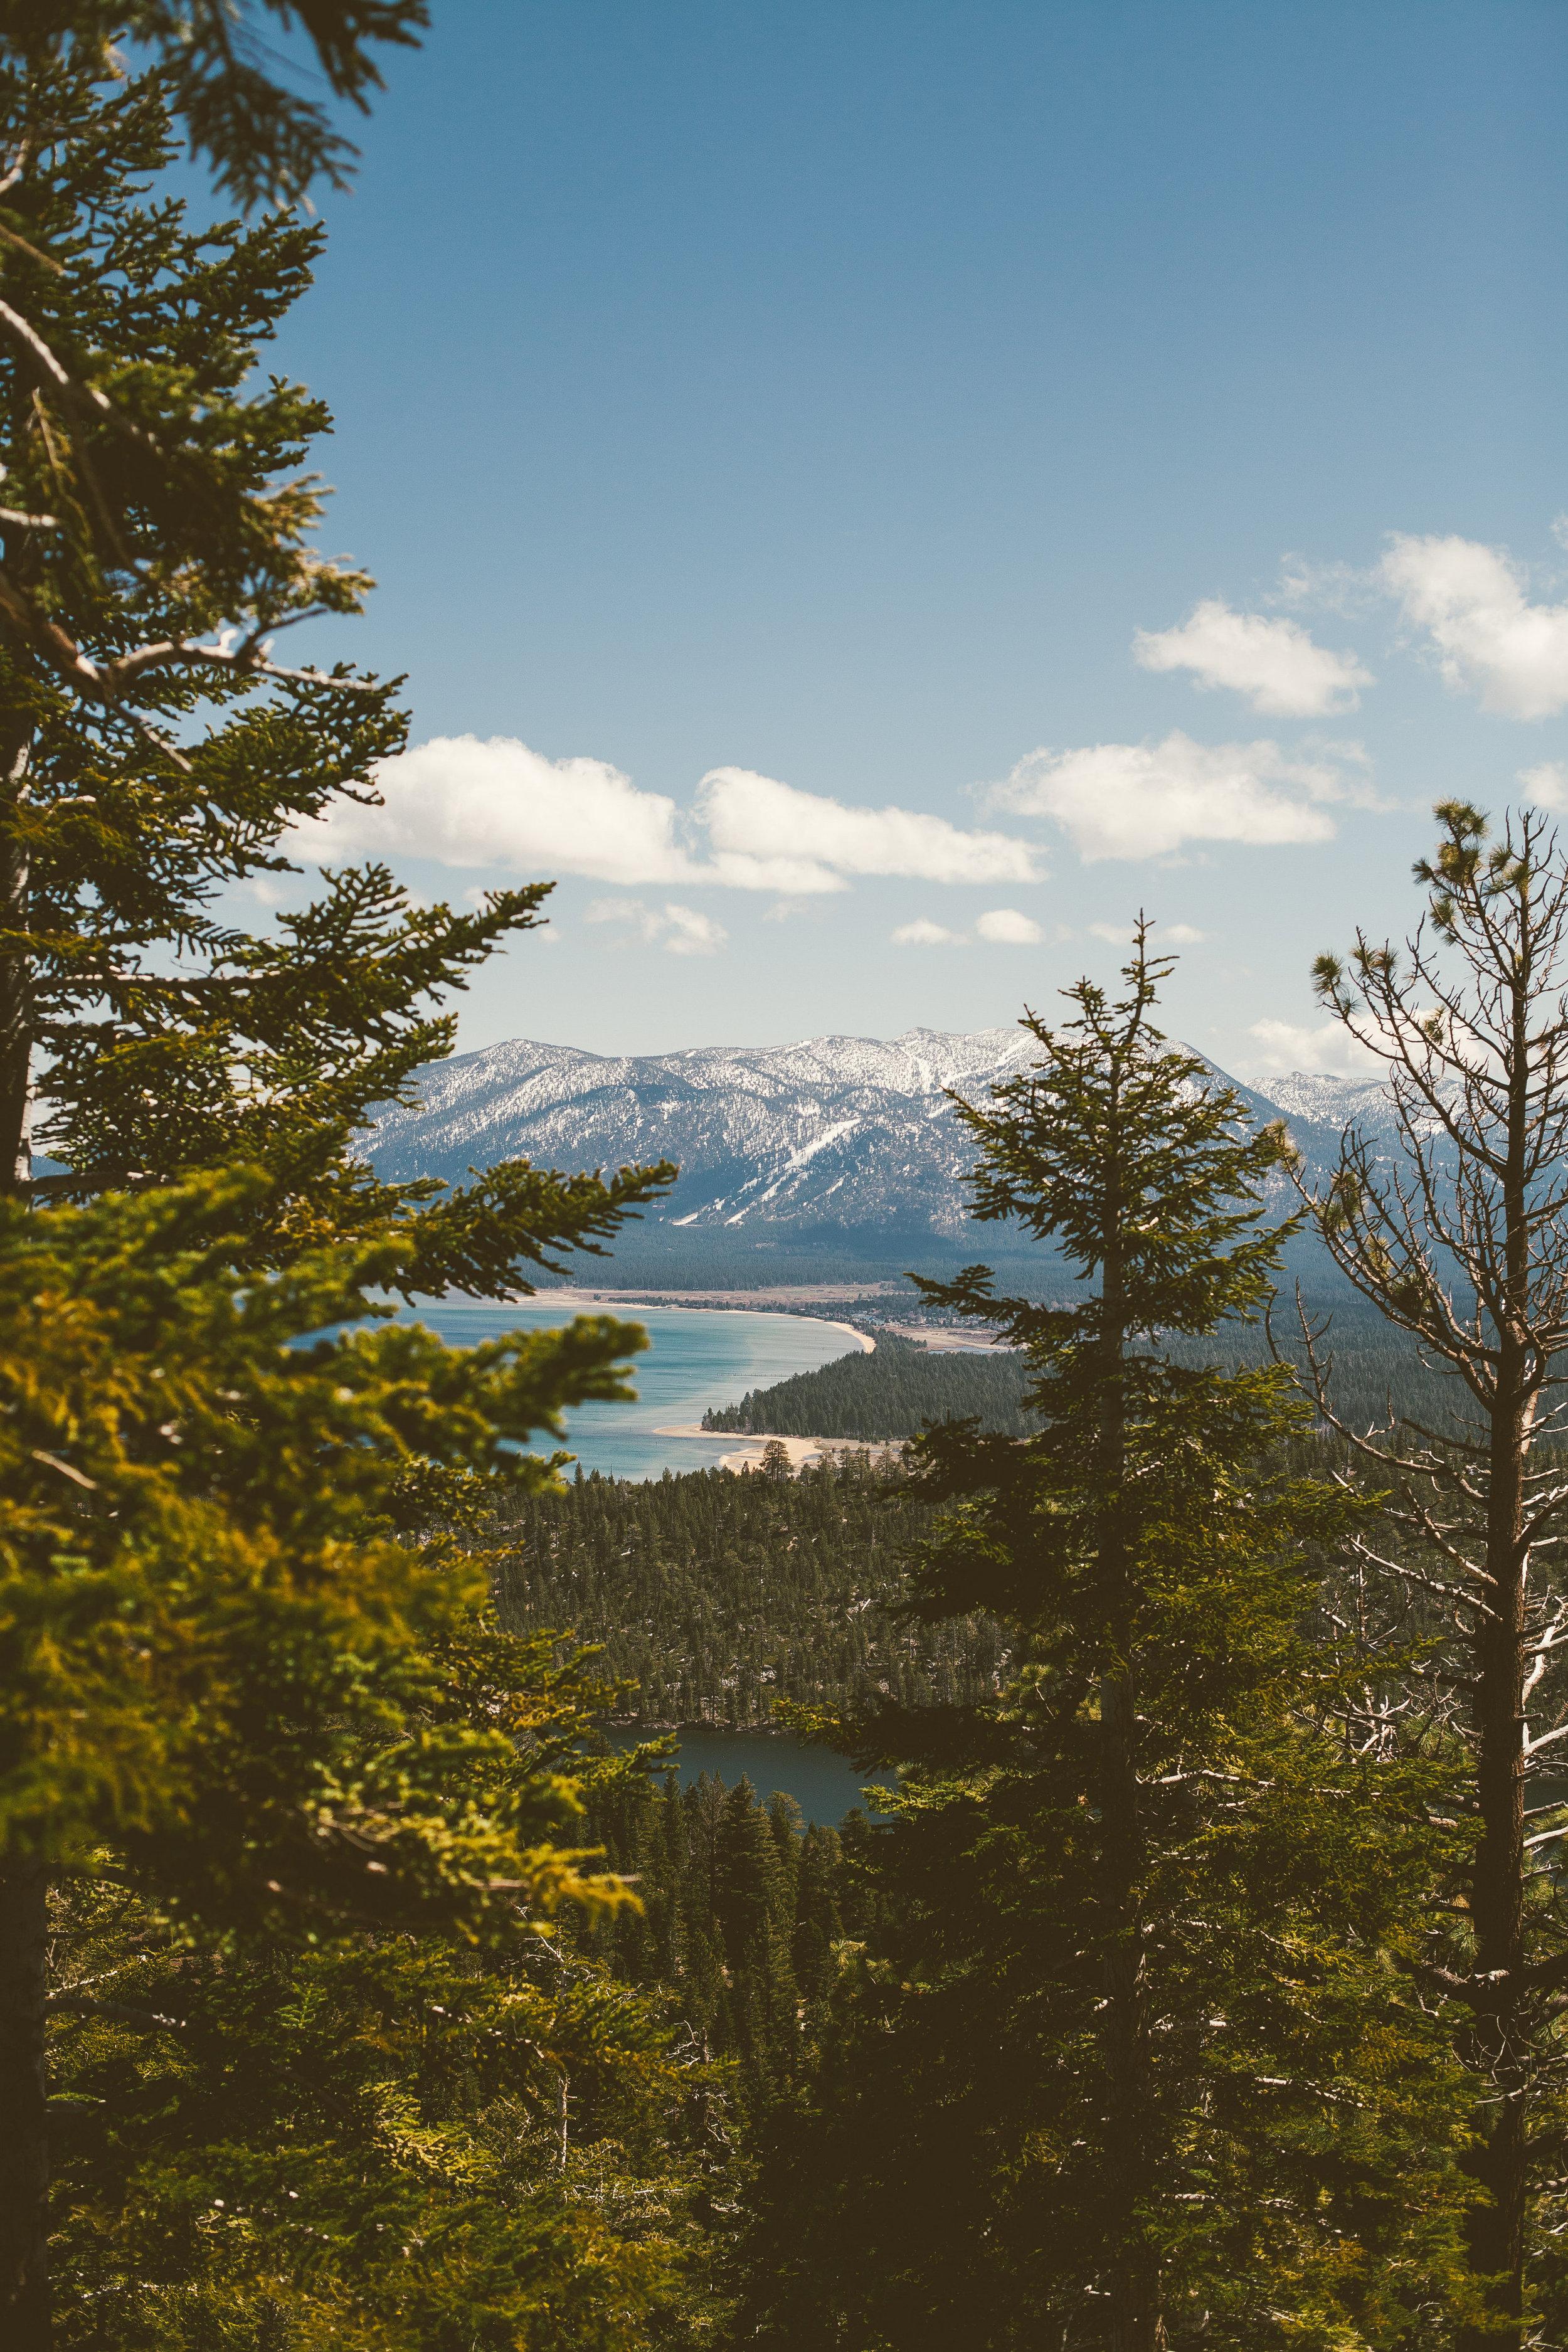 Lake Tahoe April 2016-Tahoe 4 2016-0027 (1).jpg